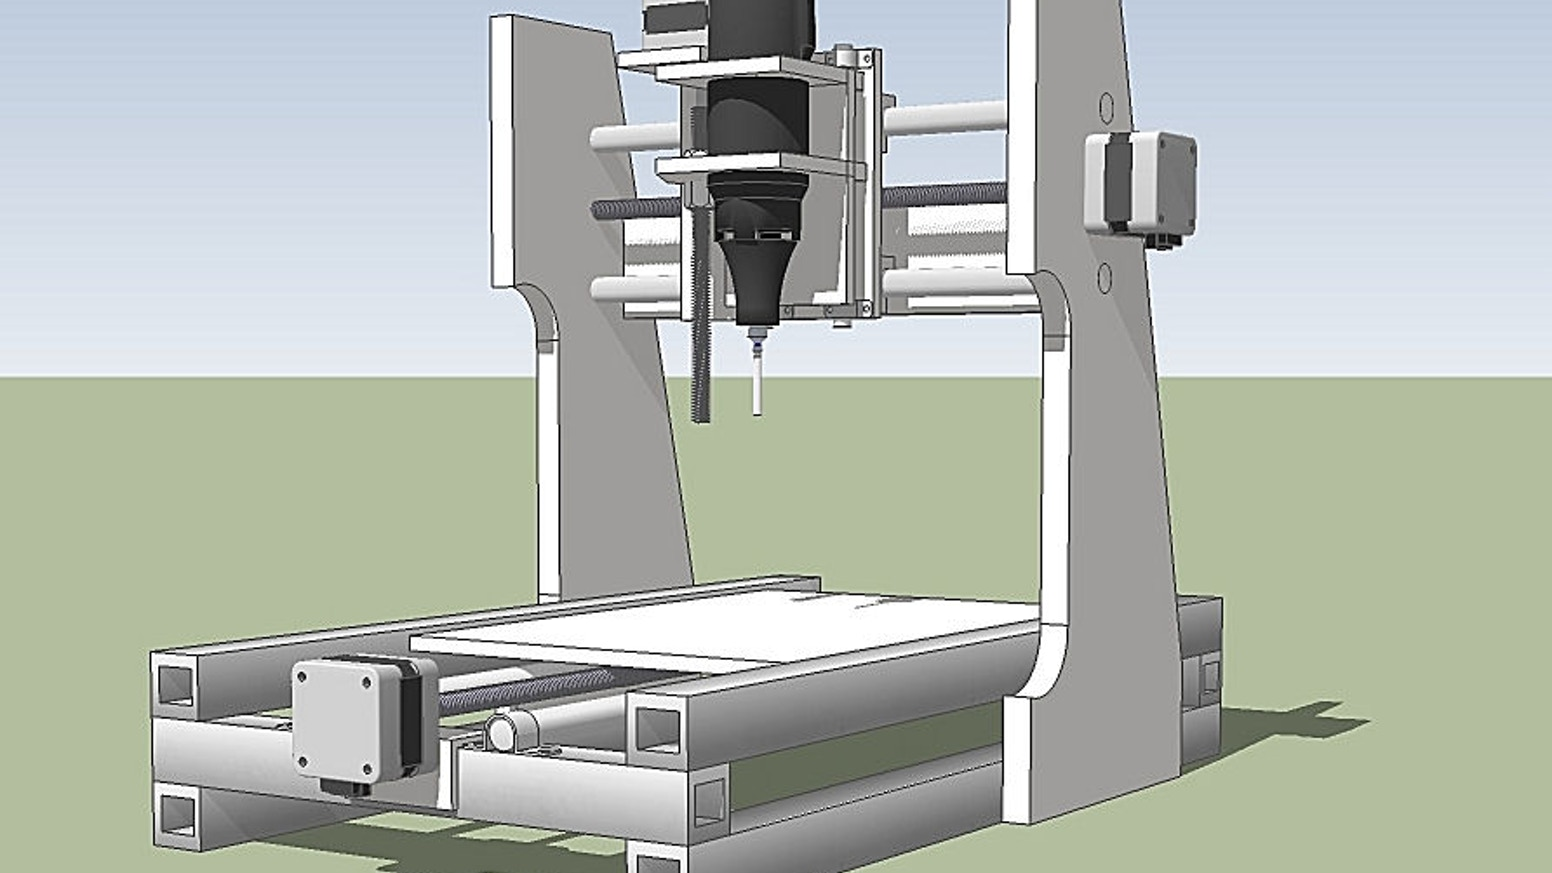 Diy Desktop Cnc Machine By Stephen Kickstarter